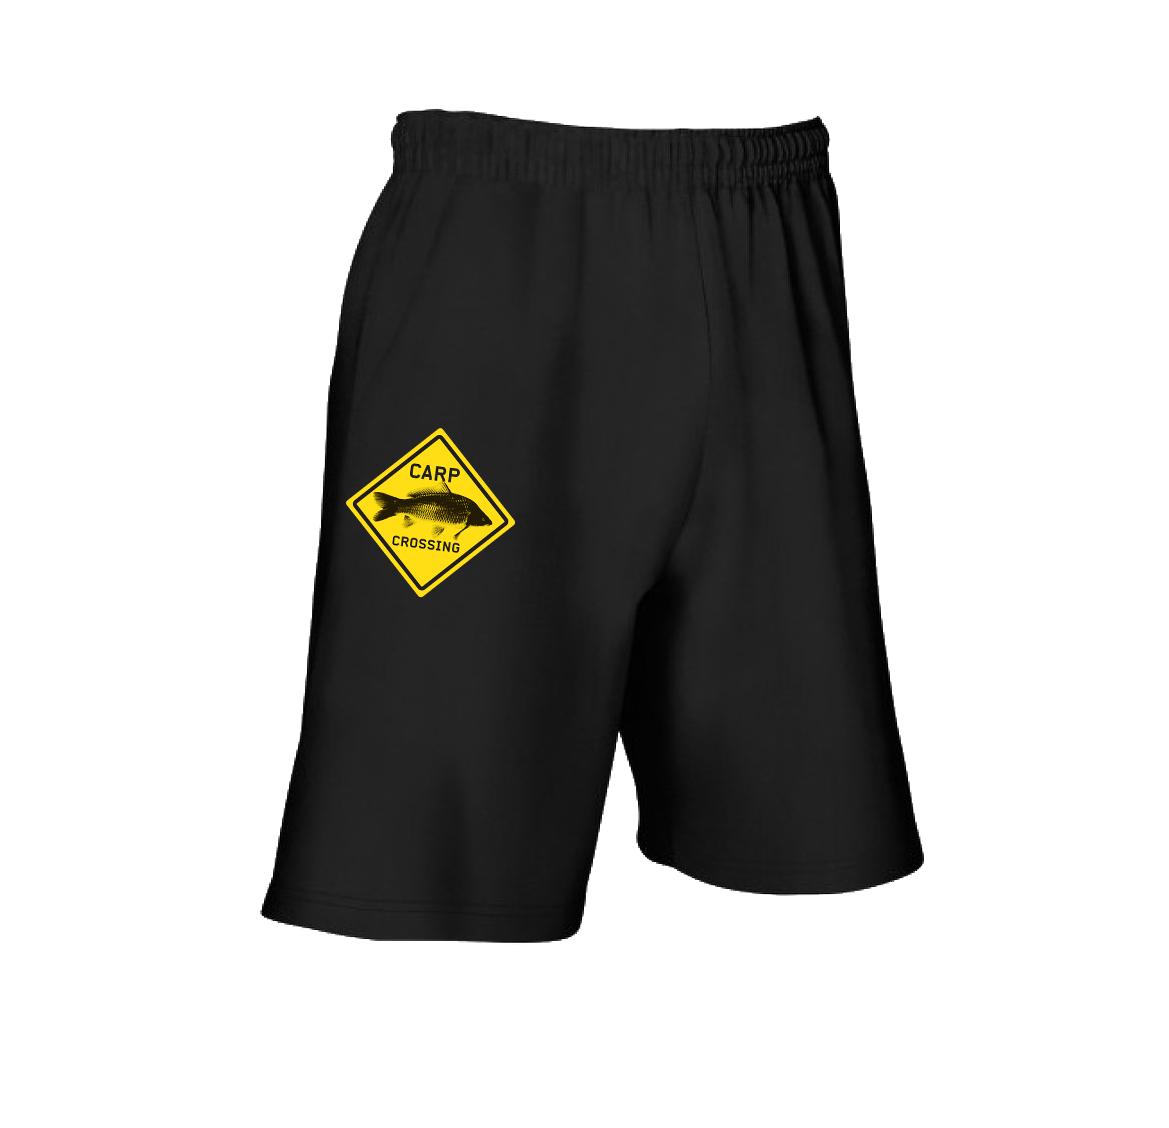 Carpcrossing Classic Short Pants